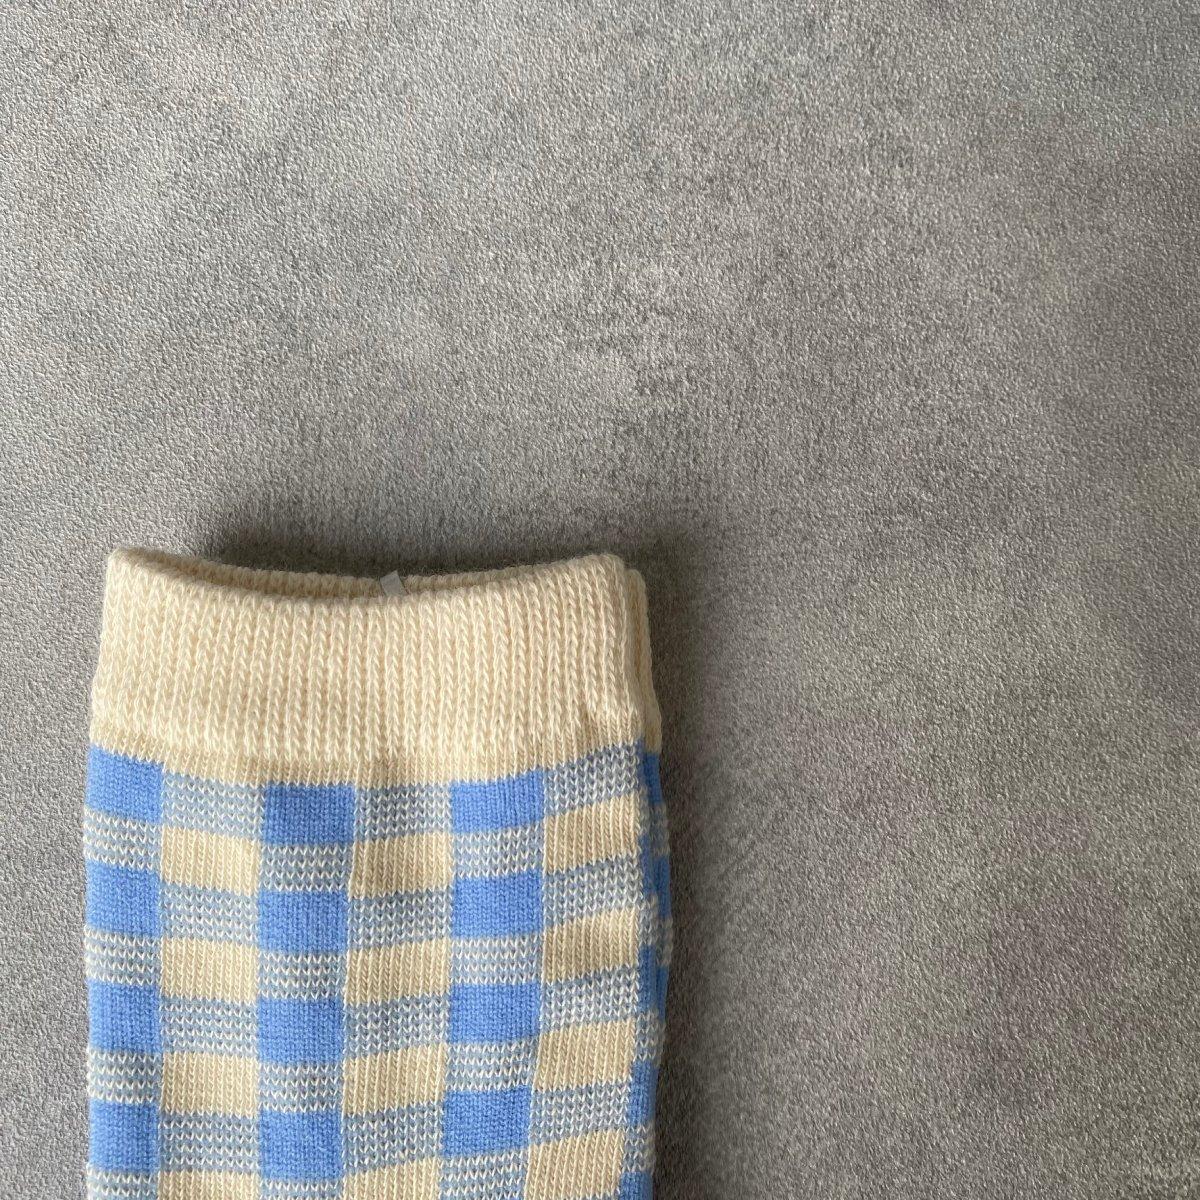 【BABY】Natural Check Socks 詳細画像13